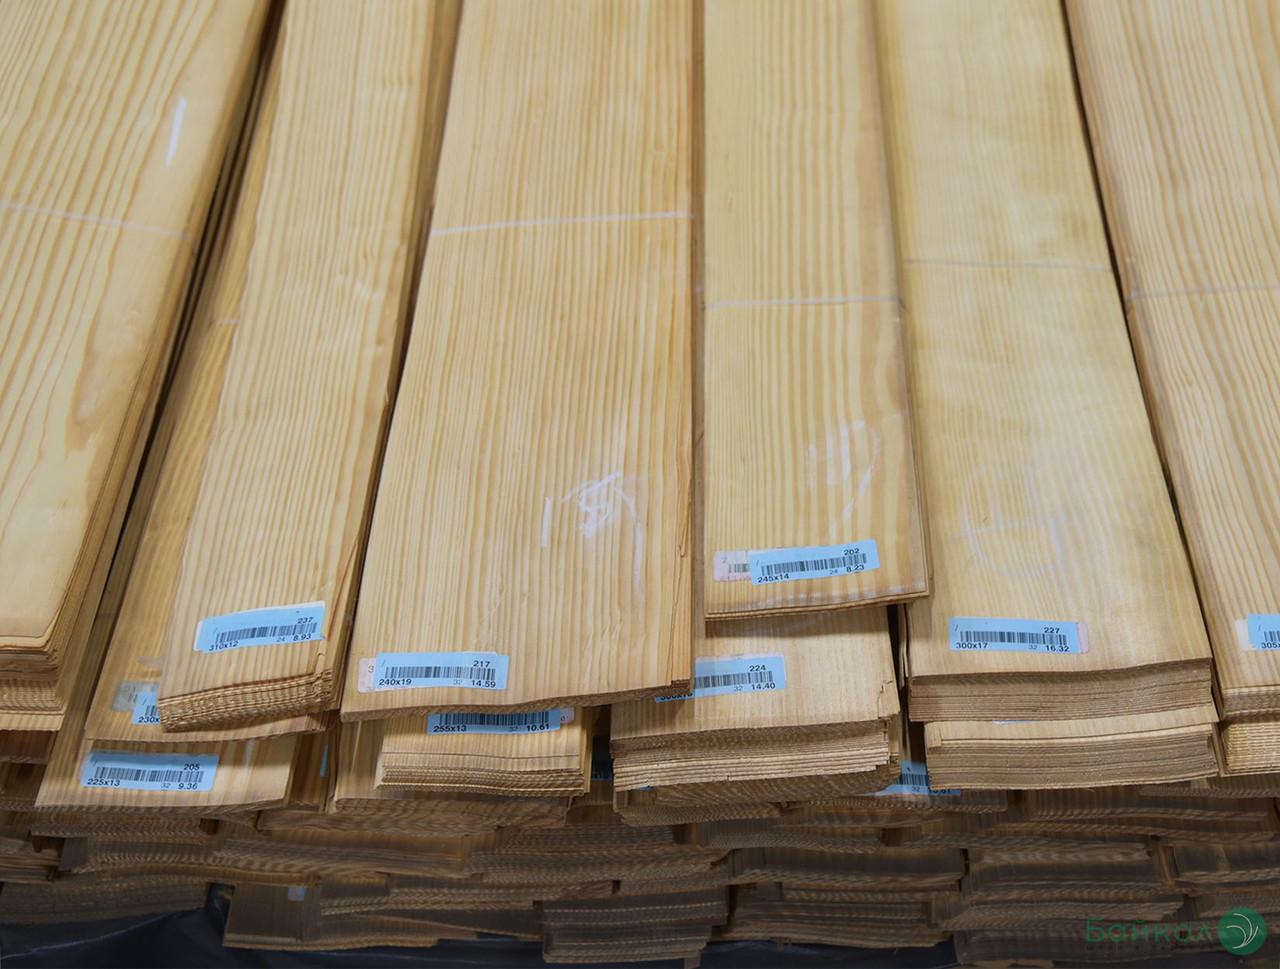 Шпон Сосна Американская – 0,6 мм, сорт I - длина от 1 м до 2 м/ ширина от 10 см+ (строганный)